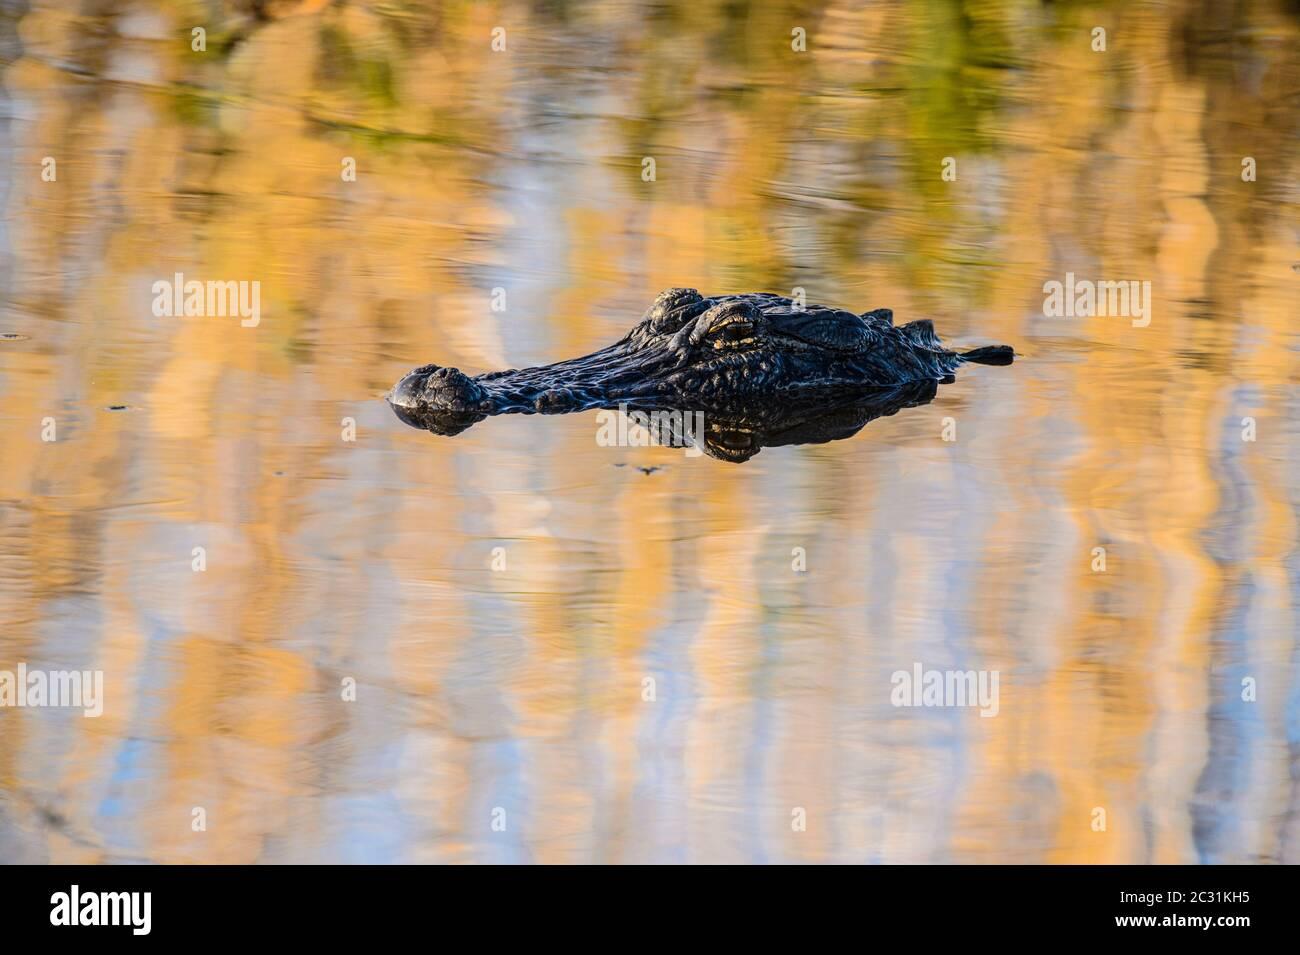 American alligator (Alligator mississipiensis), Anahuac National Wildlife Refuge, Texas, USA Stock Photo